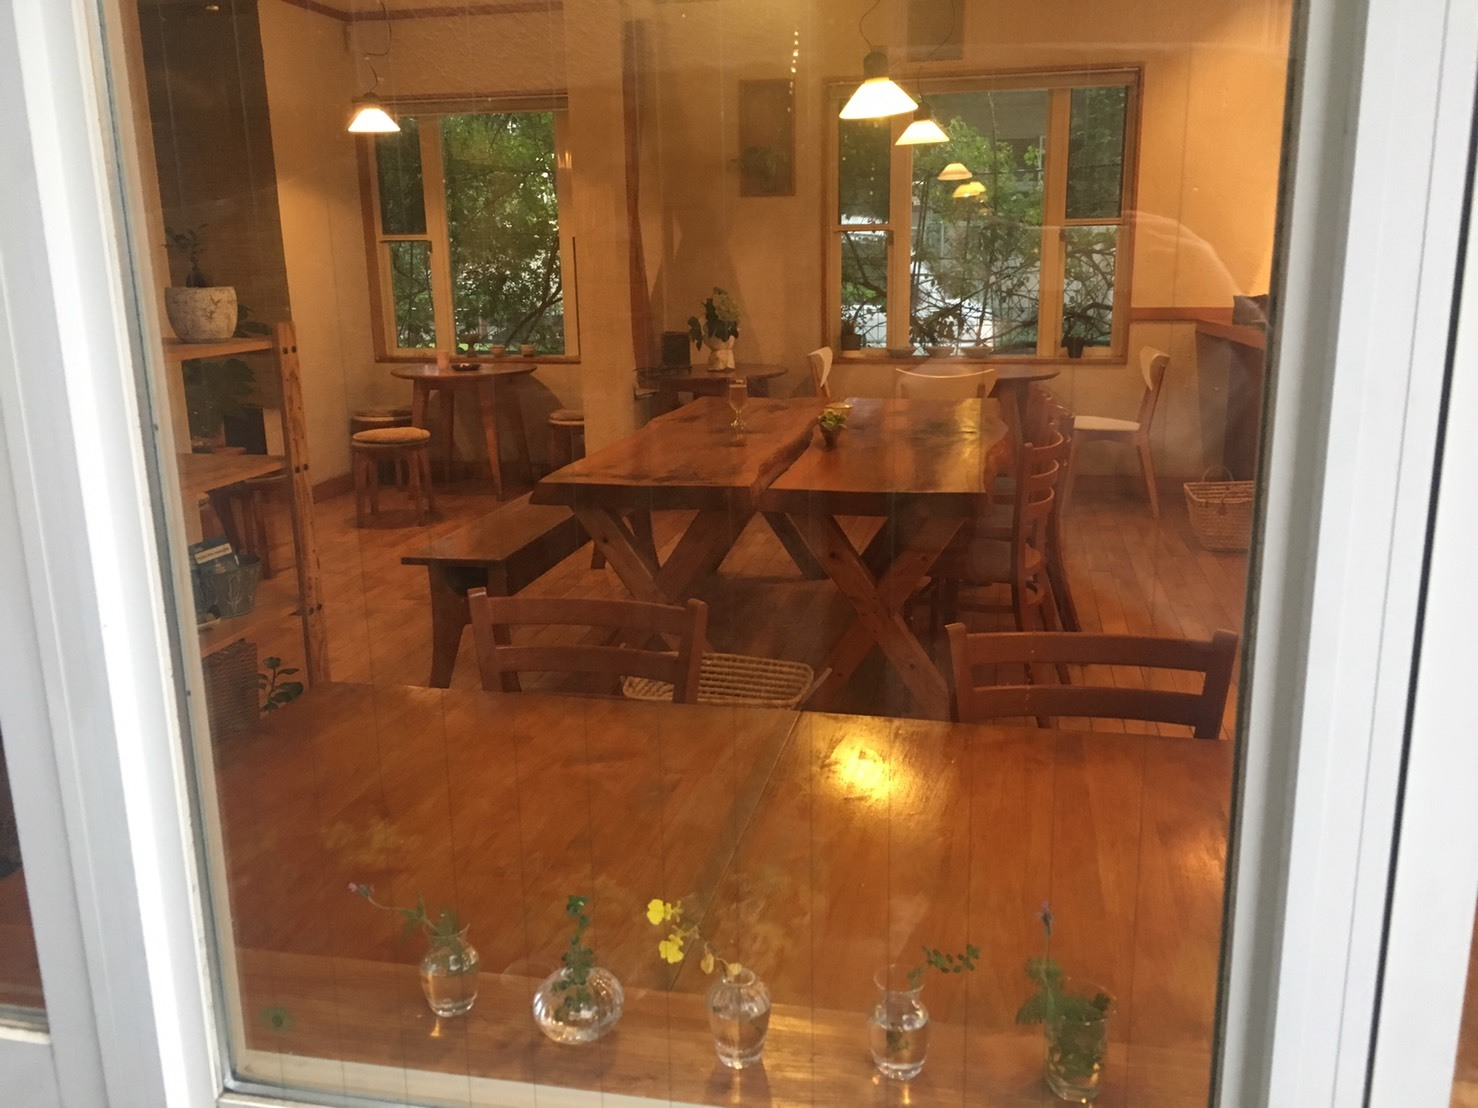 coffee&ギャラリー杏樹 ギャラリースペースの室内の写真